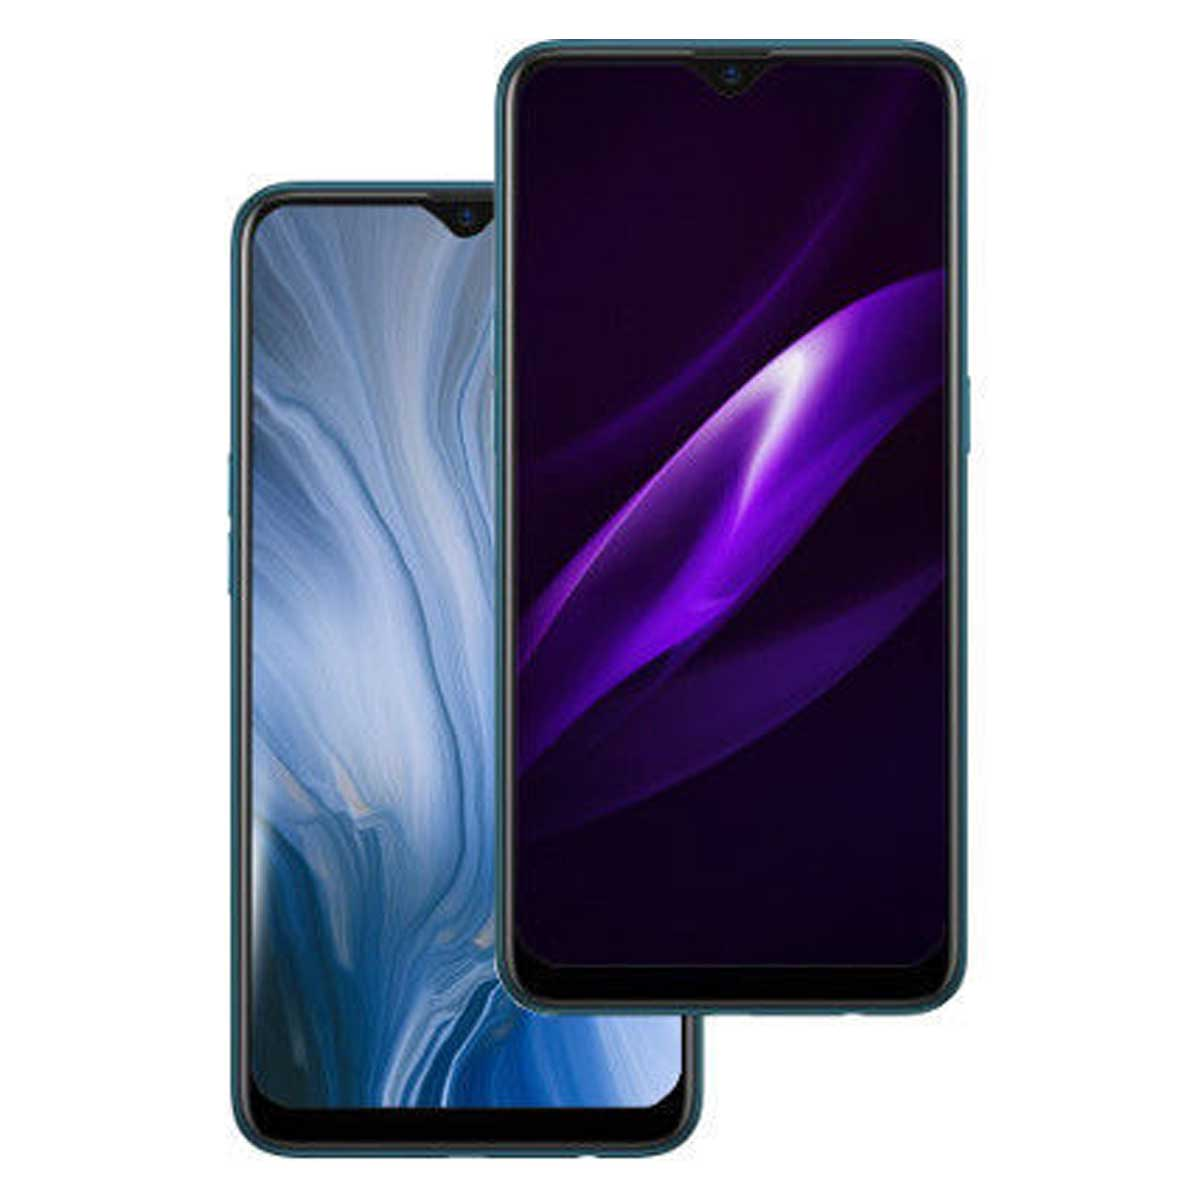 Oppo F17 256gb Price In India Full Specs 16th January 2021 Digit